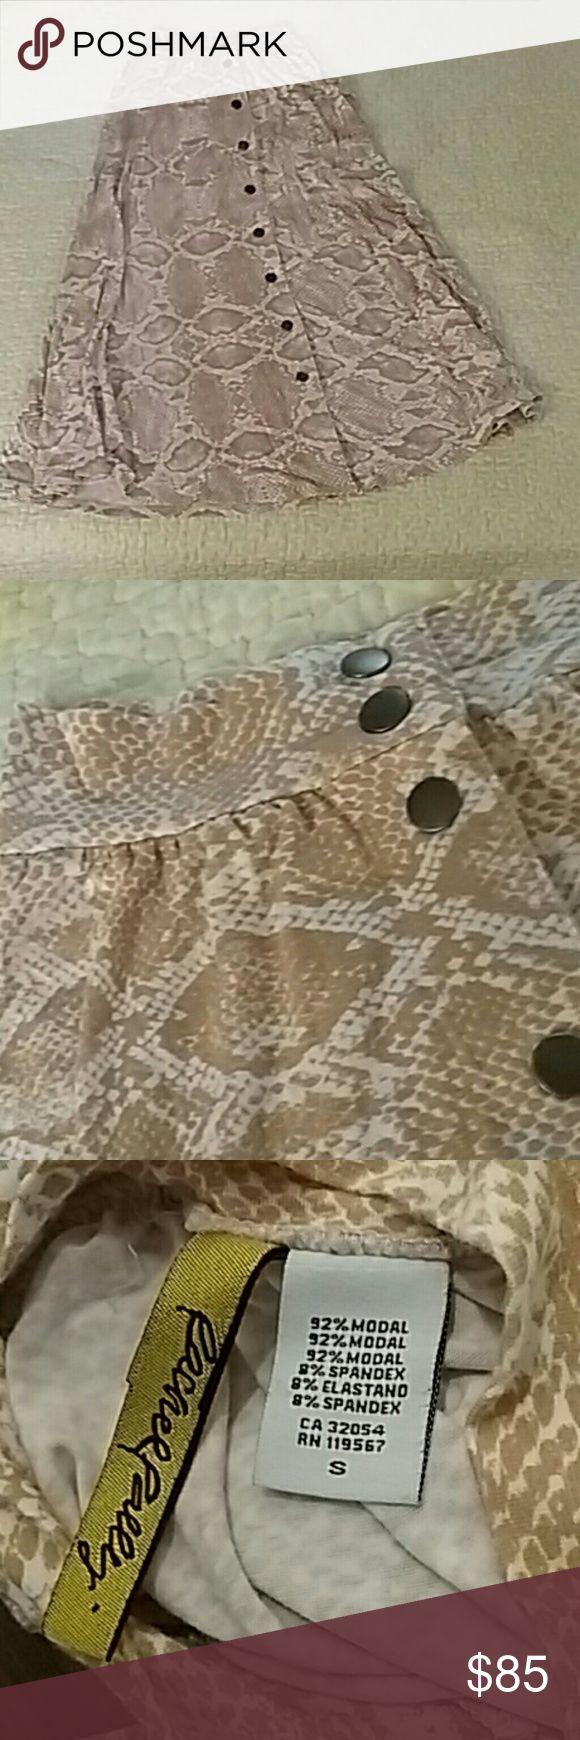 "Rachel Pally snake skin print skirt Lycra like stretchy rayon/spandex woven snap up skirt  just below knee and i am 5'4"" Rachel Pally Skirts"